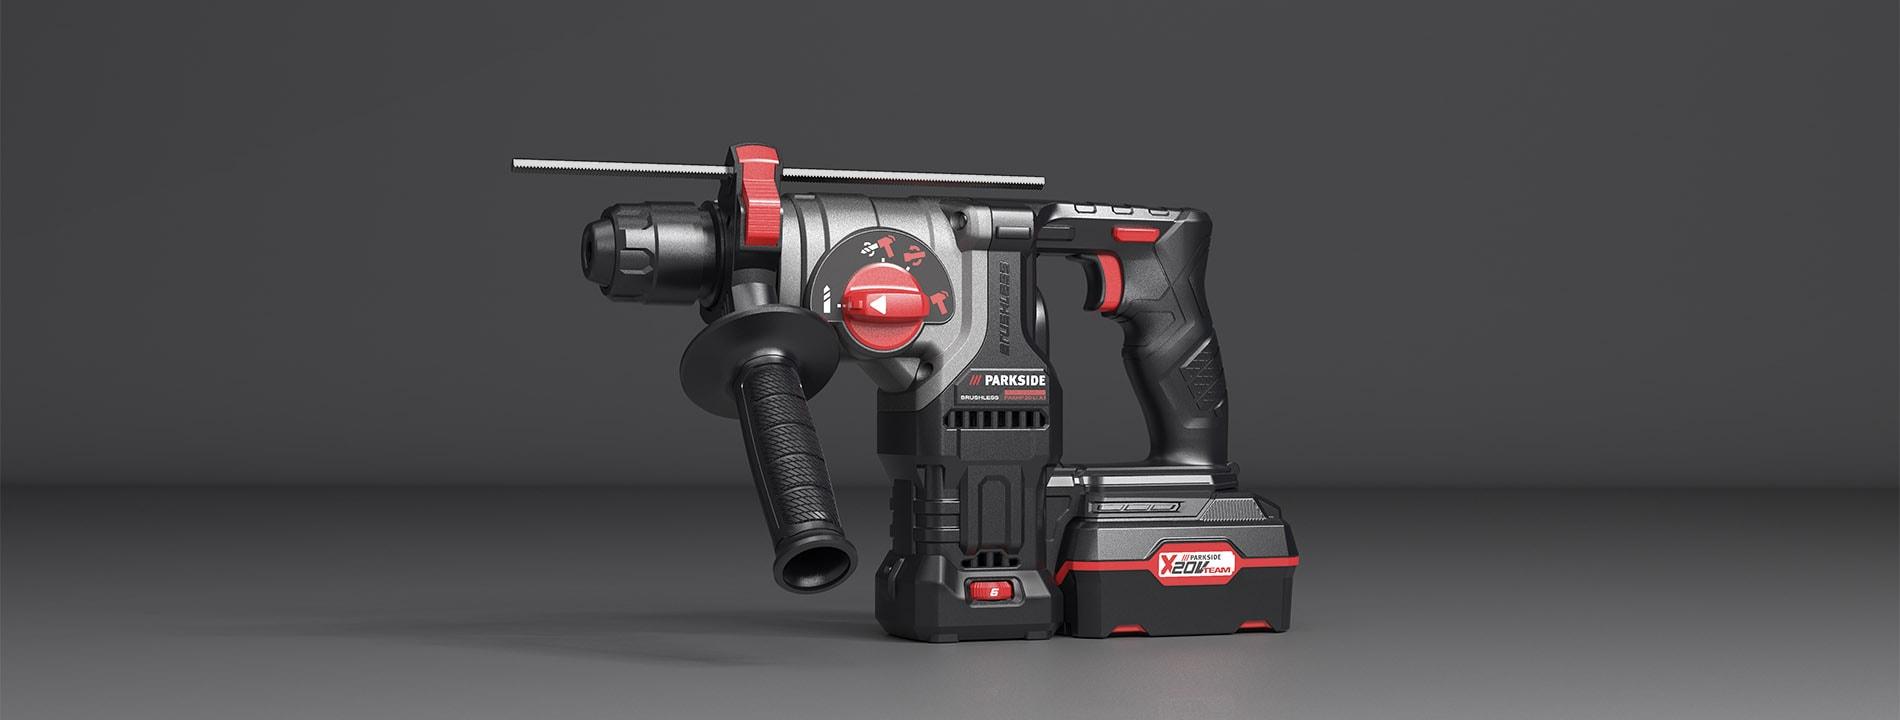 projekter_indusrial_design_powertools_performance_hammer_20V